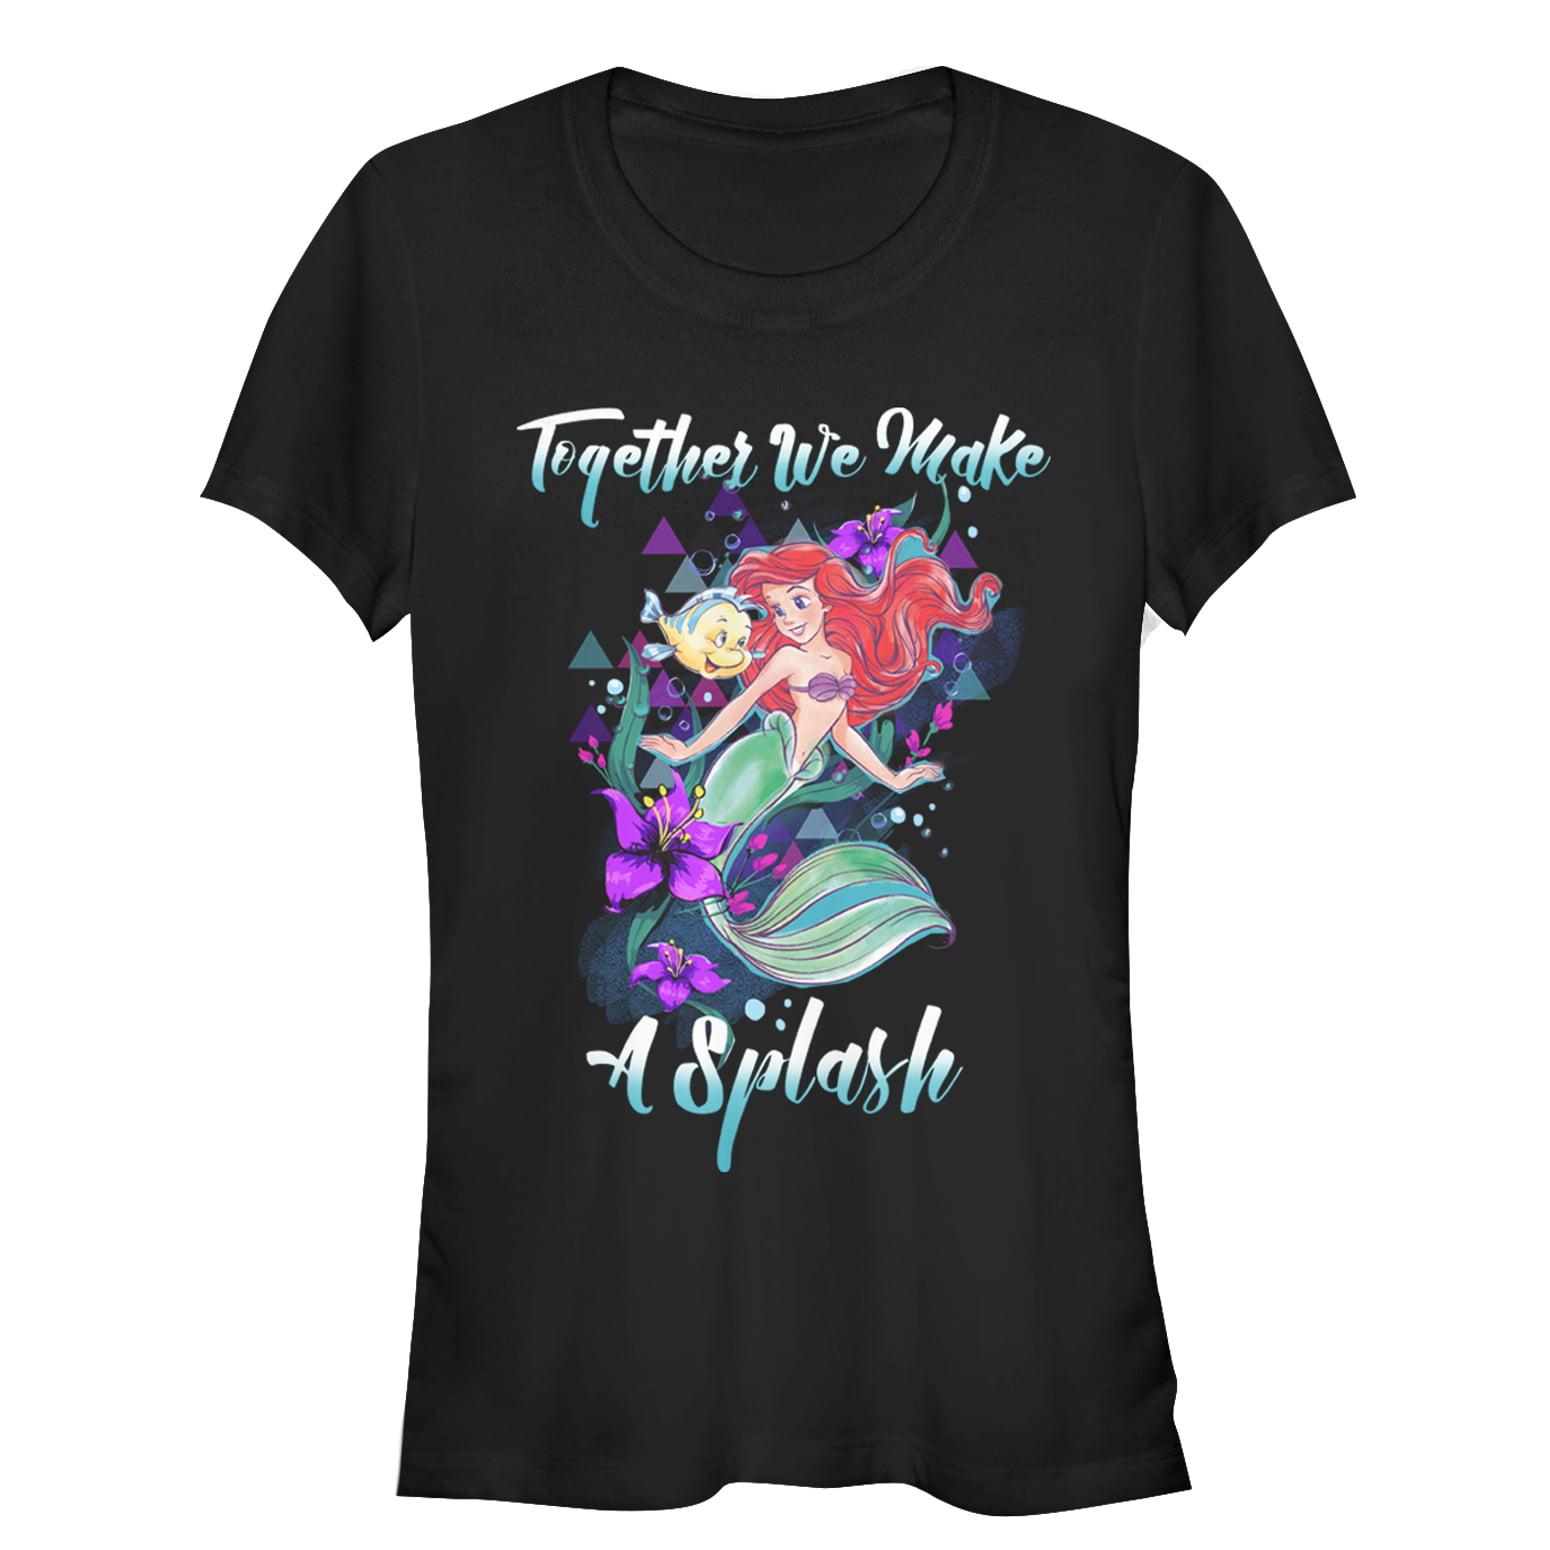 The Little Mermaid Juniors' Make a Splash T-Shirt